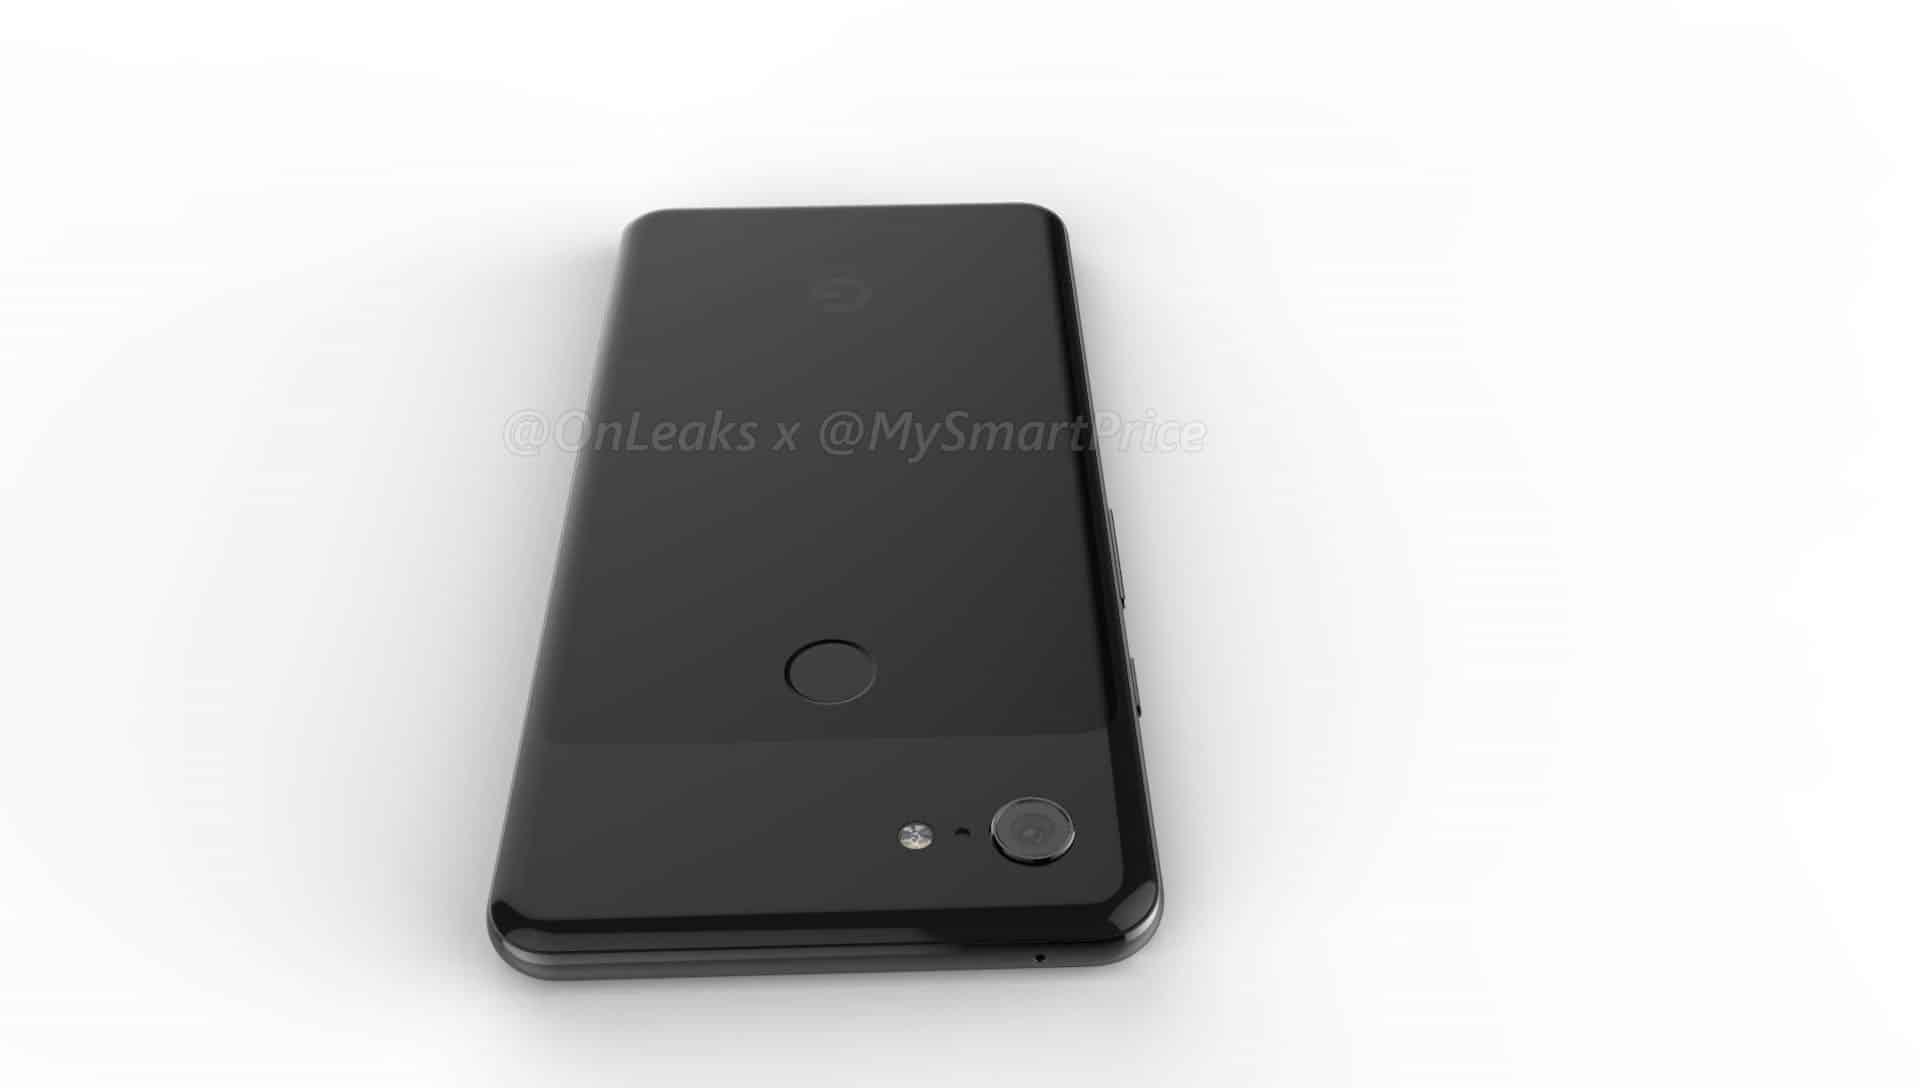 Google Pixel 3 XL MySmart Price 3